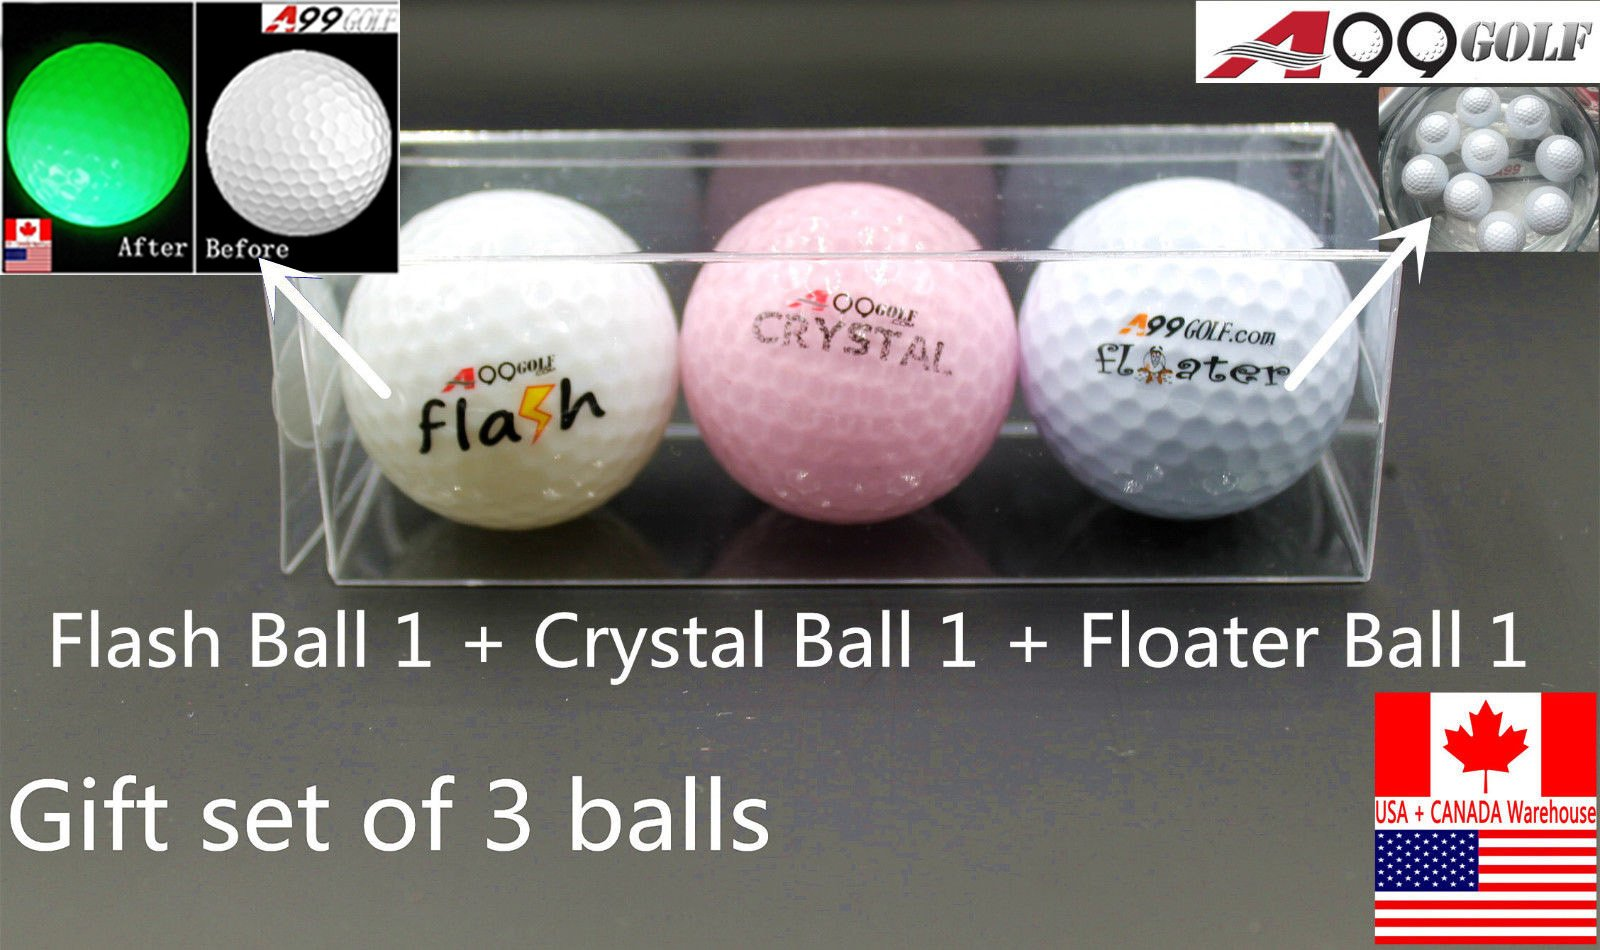 A99 Golf Gift Set of Balls 1 Crystal Ball+1 Flshing Ball + 1 Floater Ball by A99 Golf